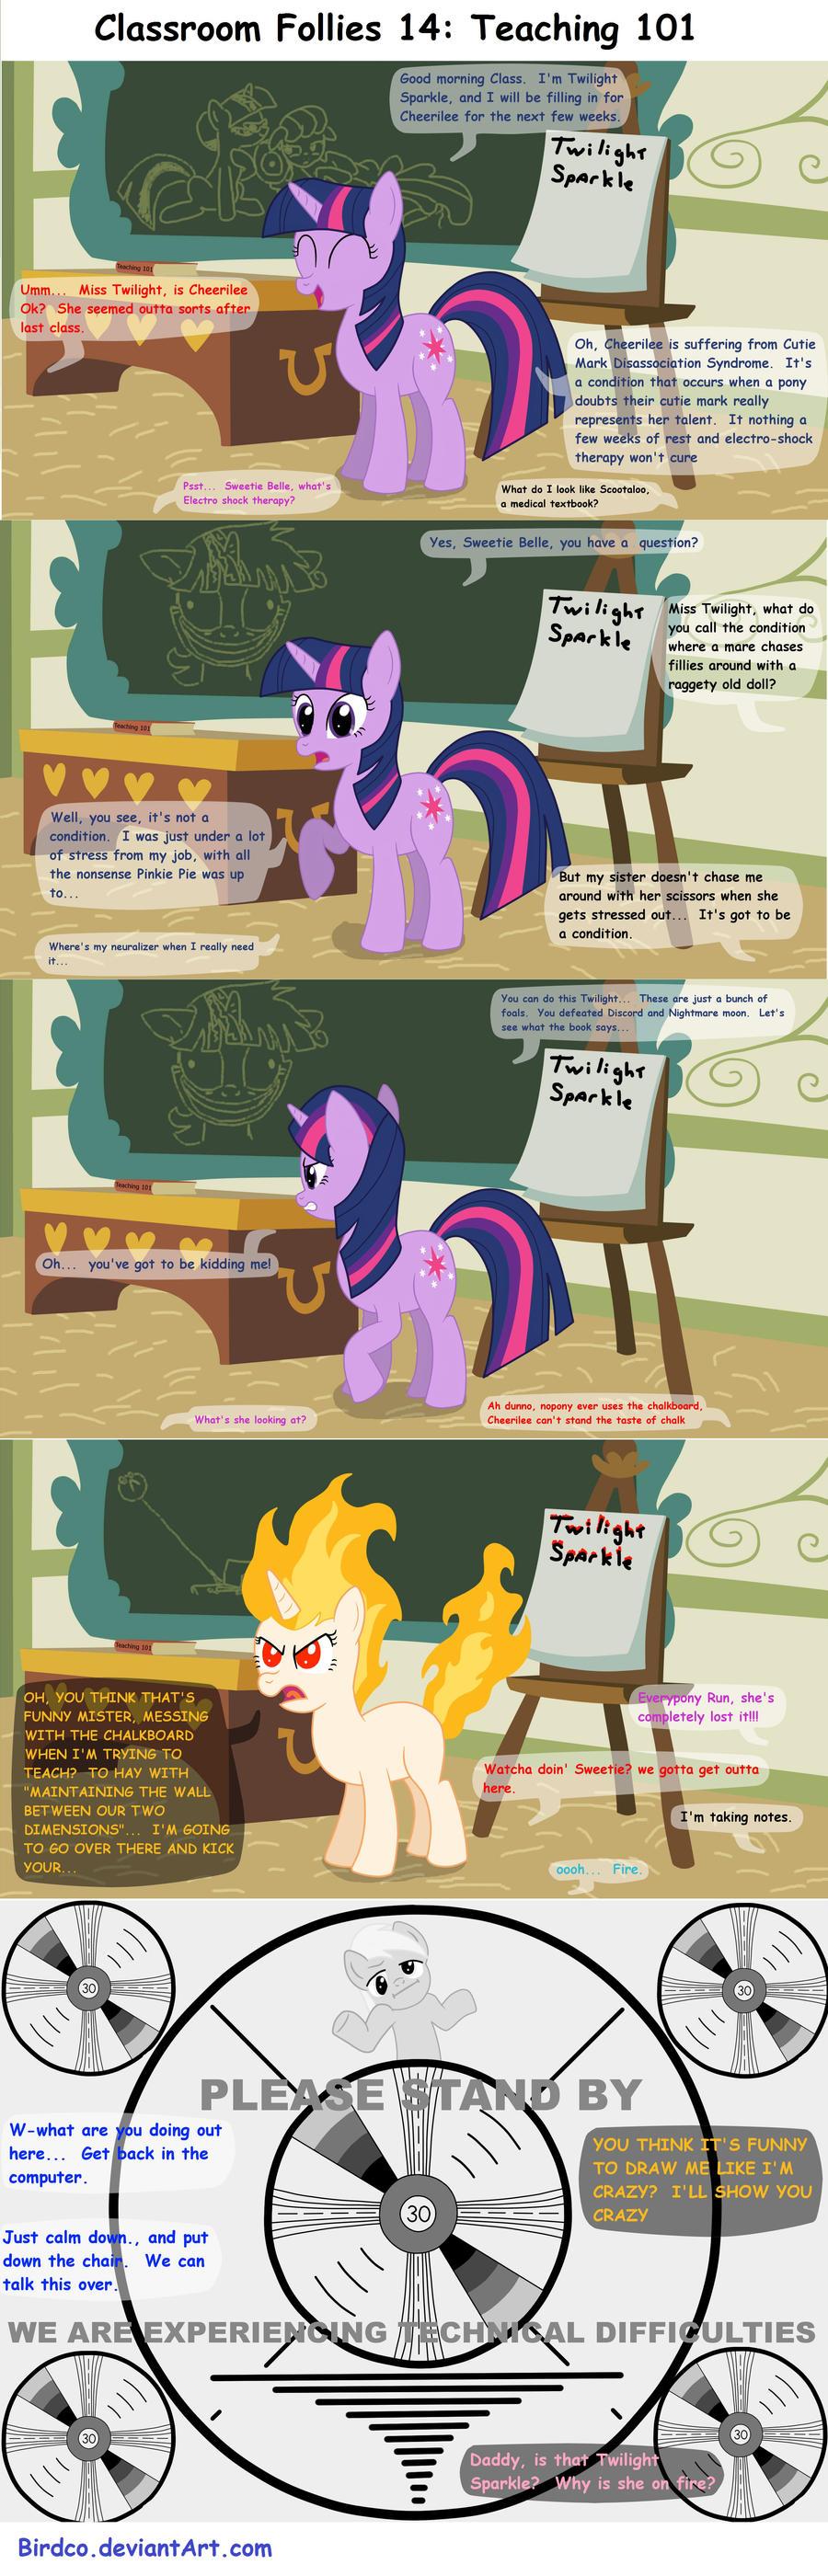 Classroom Follies 14 by Birdco